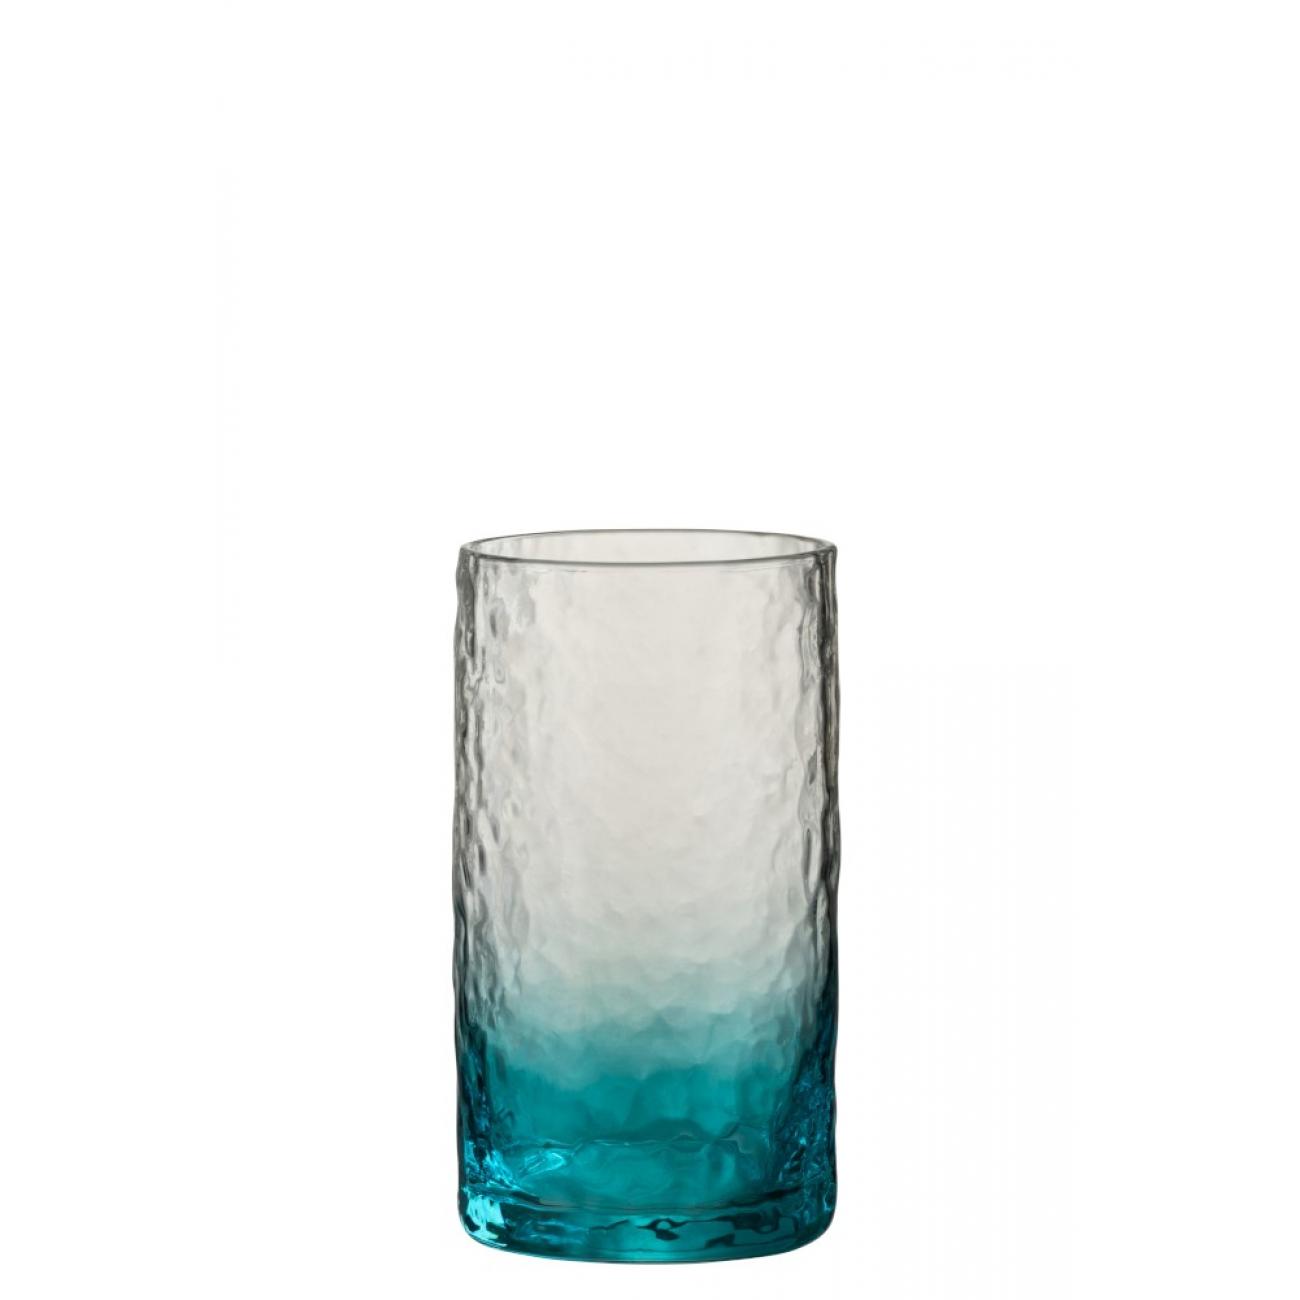 Стакан J-LINE стеклянный синий объем 350 мл